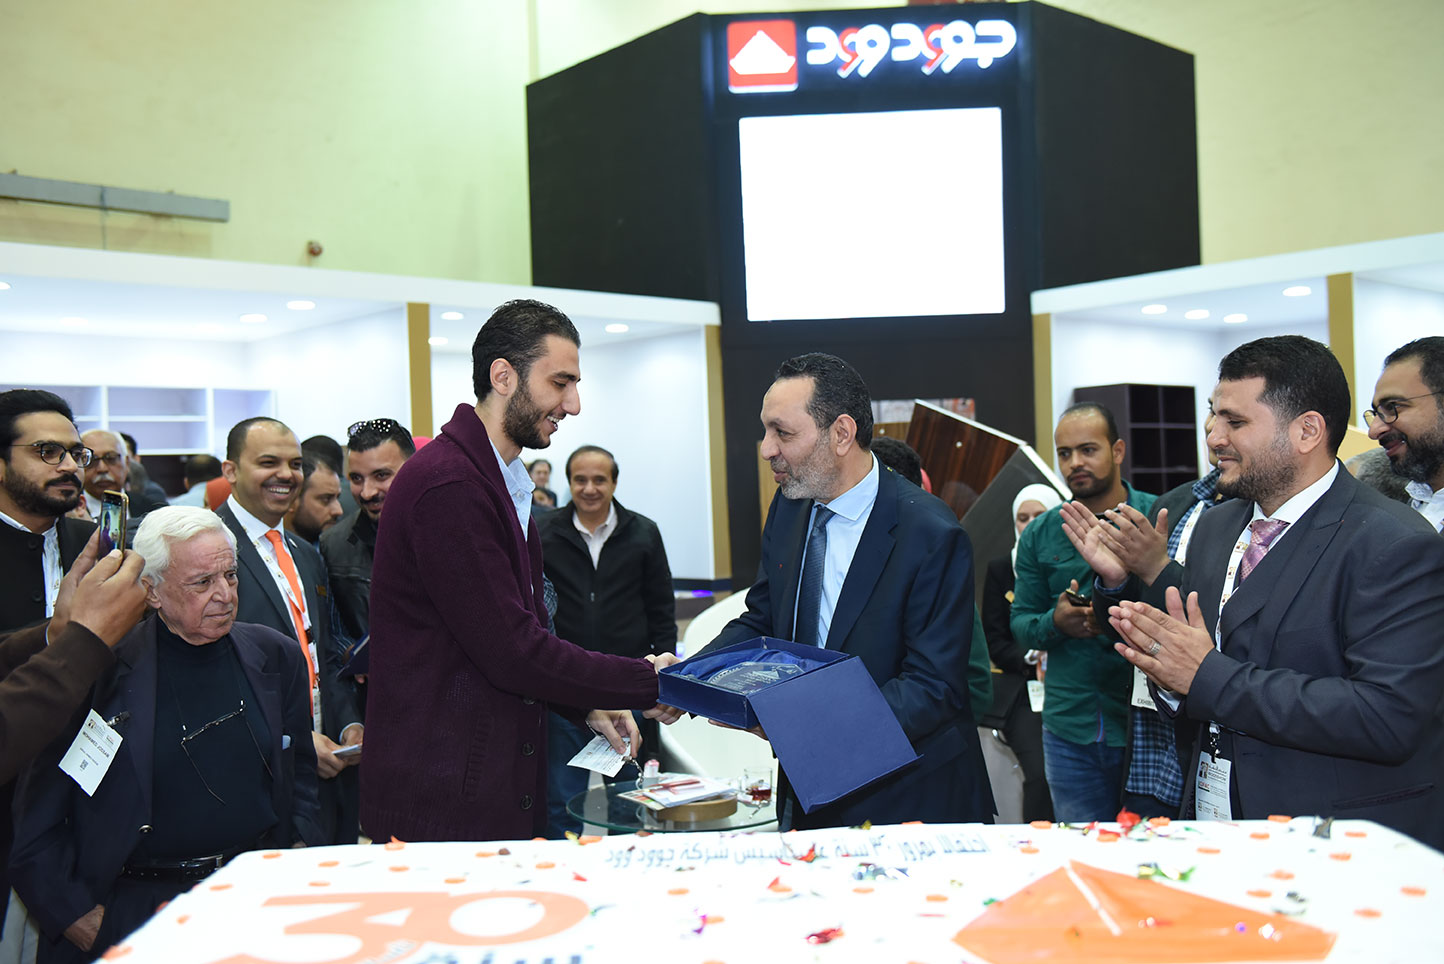 Cairo Wood Show 2018 13